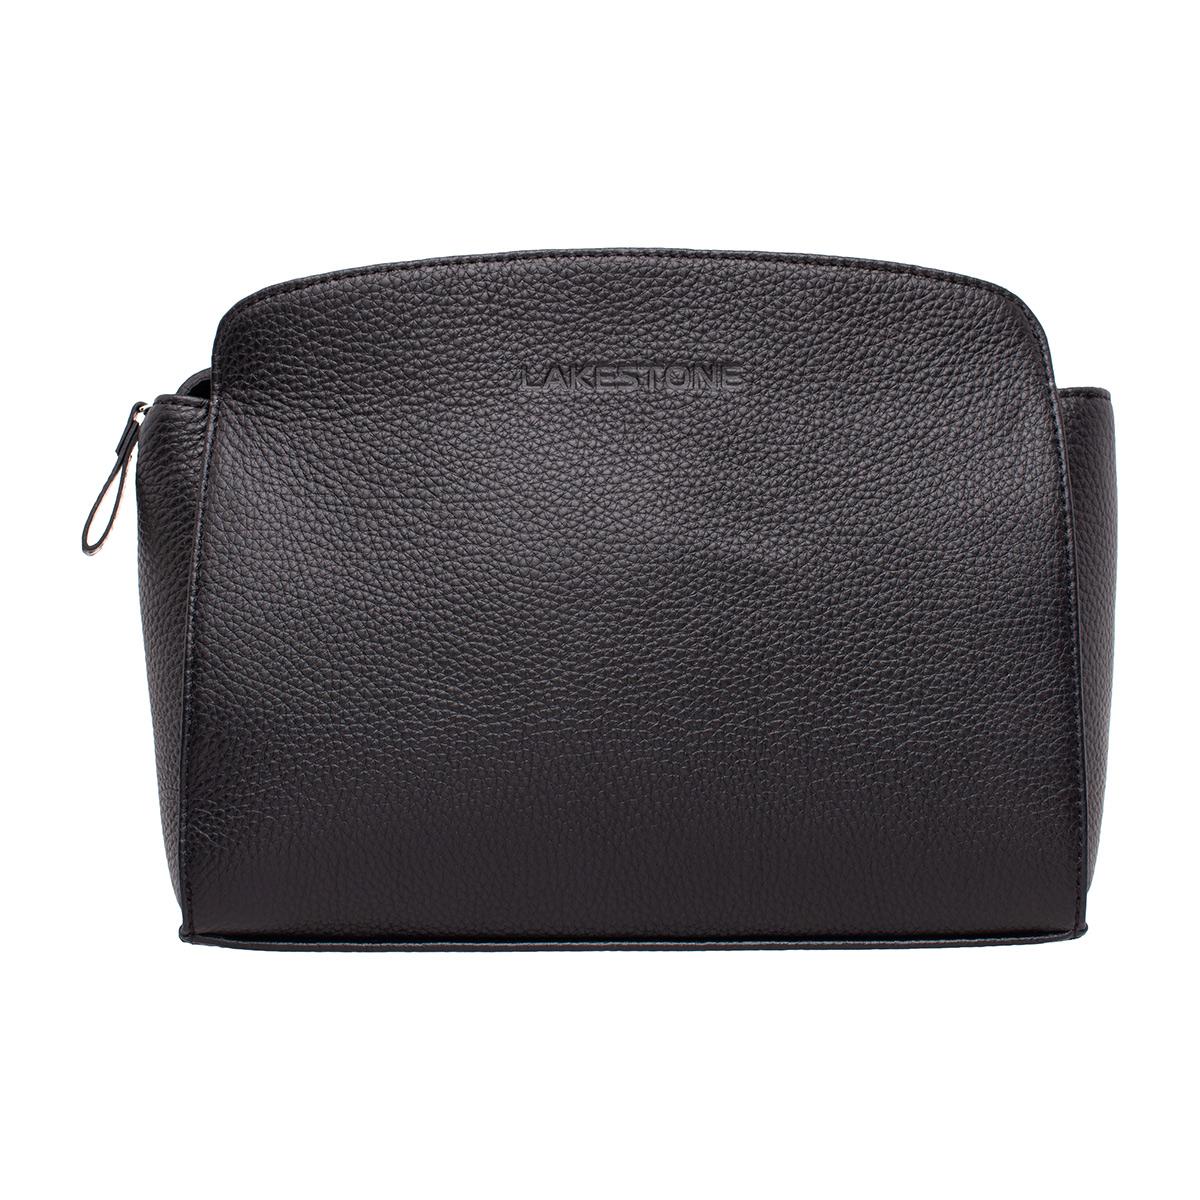 Женская сумка Caledonia Black фото